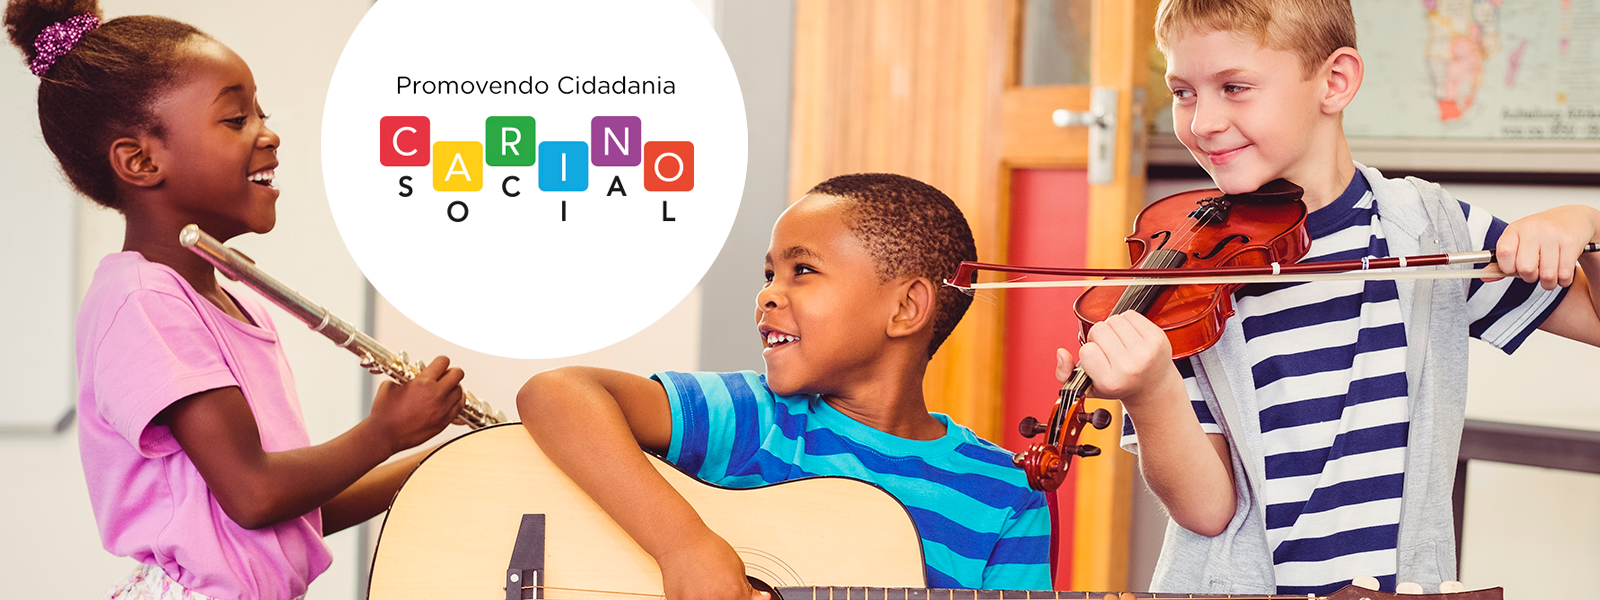 banner-carino-ingredientes-sustentabilidade-ong-social-musica-aulas-crianca